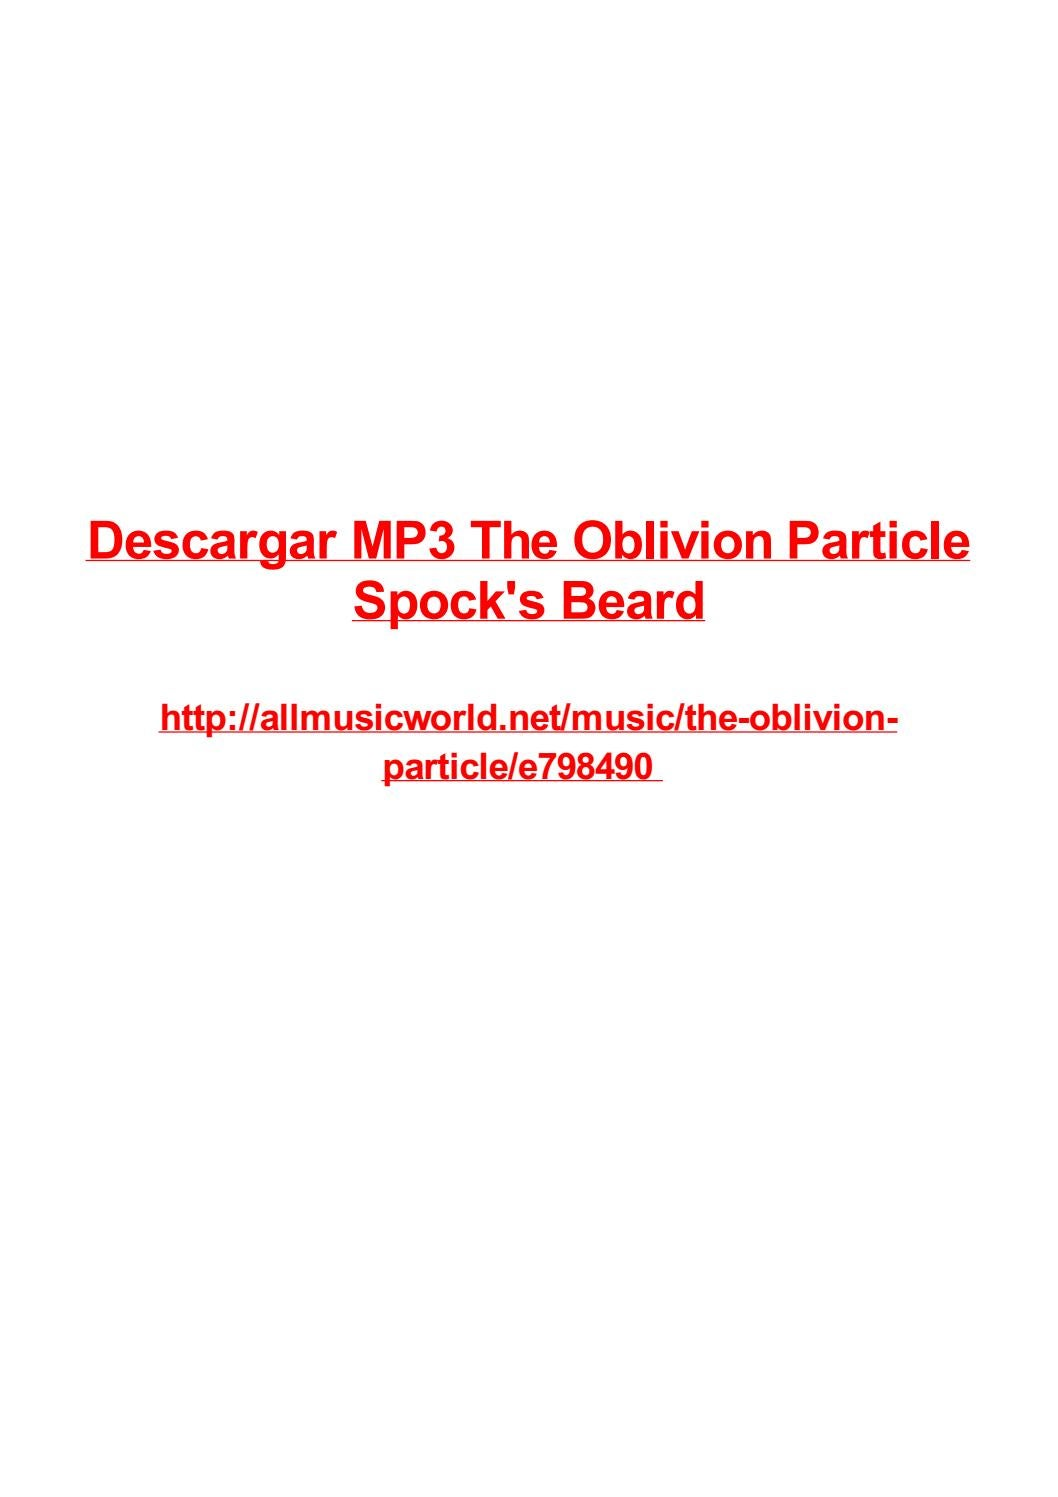 Descargar Mp3 The Oblivion Particle Spocks Beard By Max Polansky Issuu